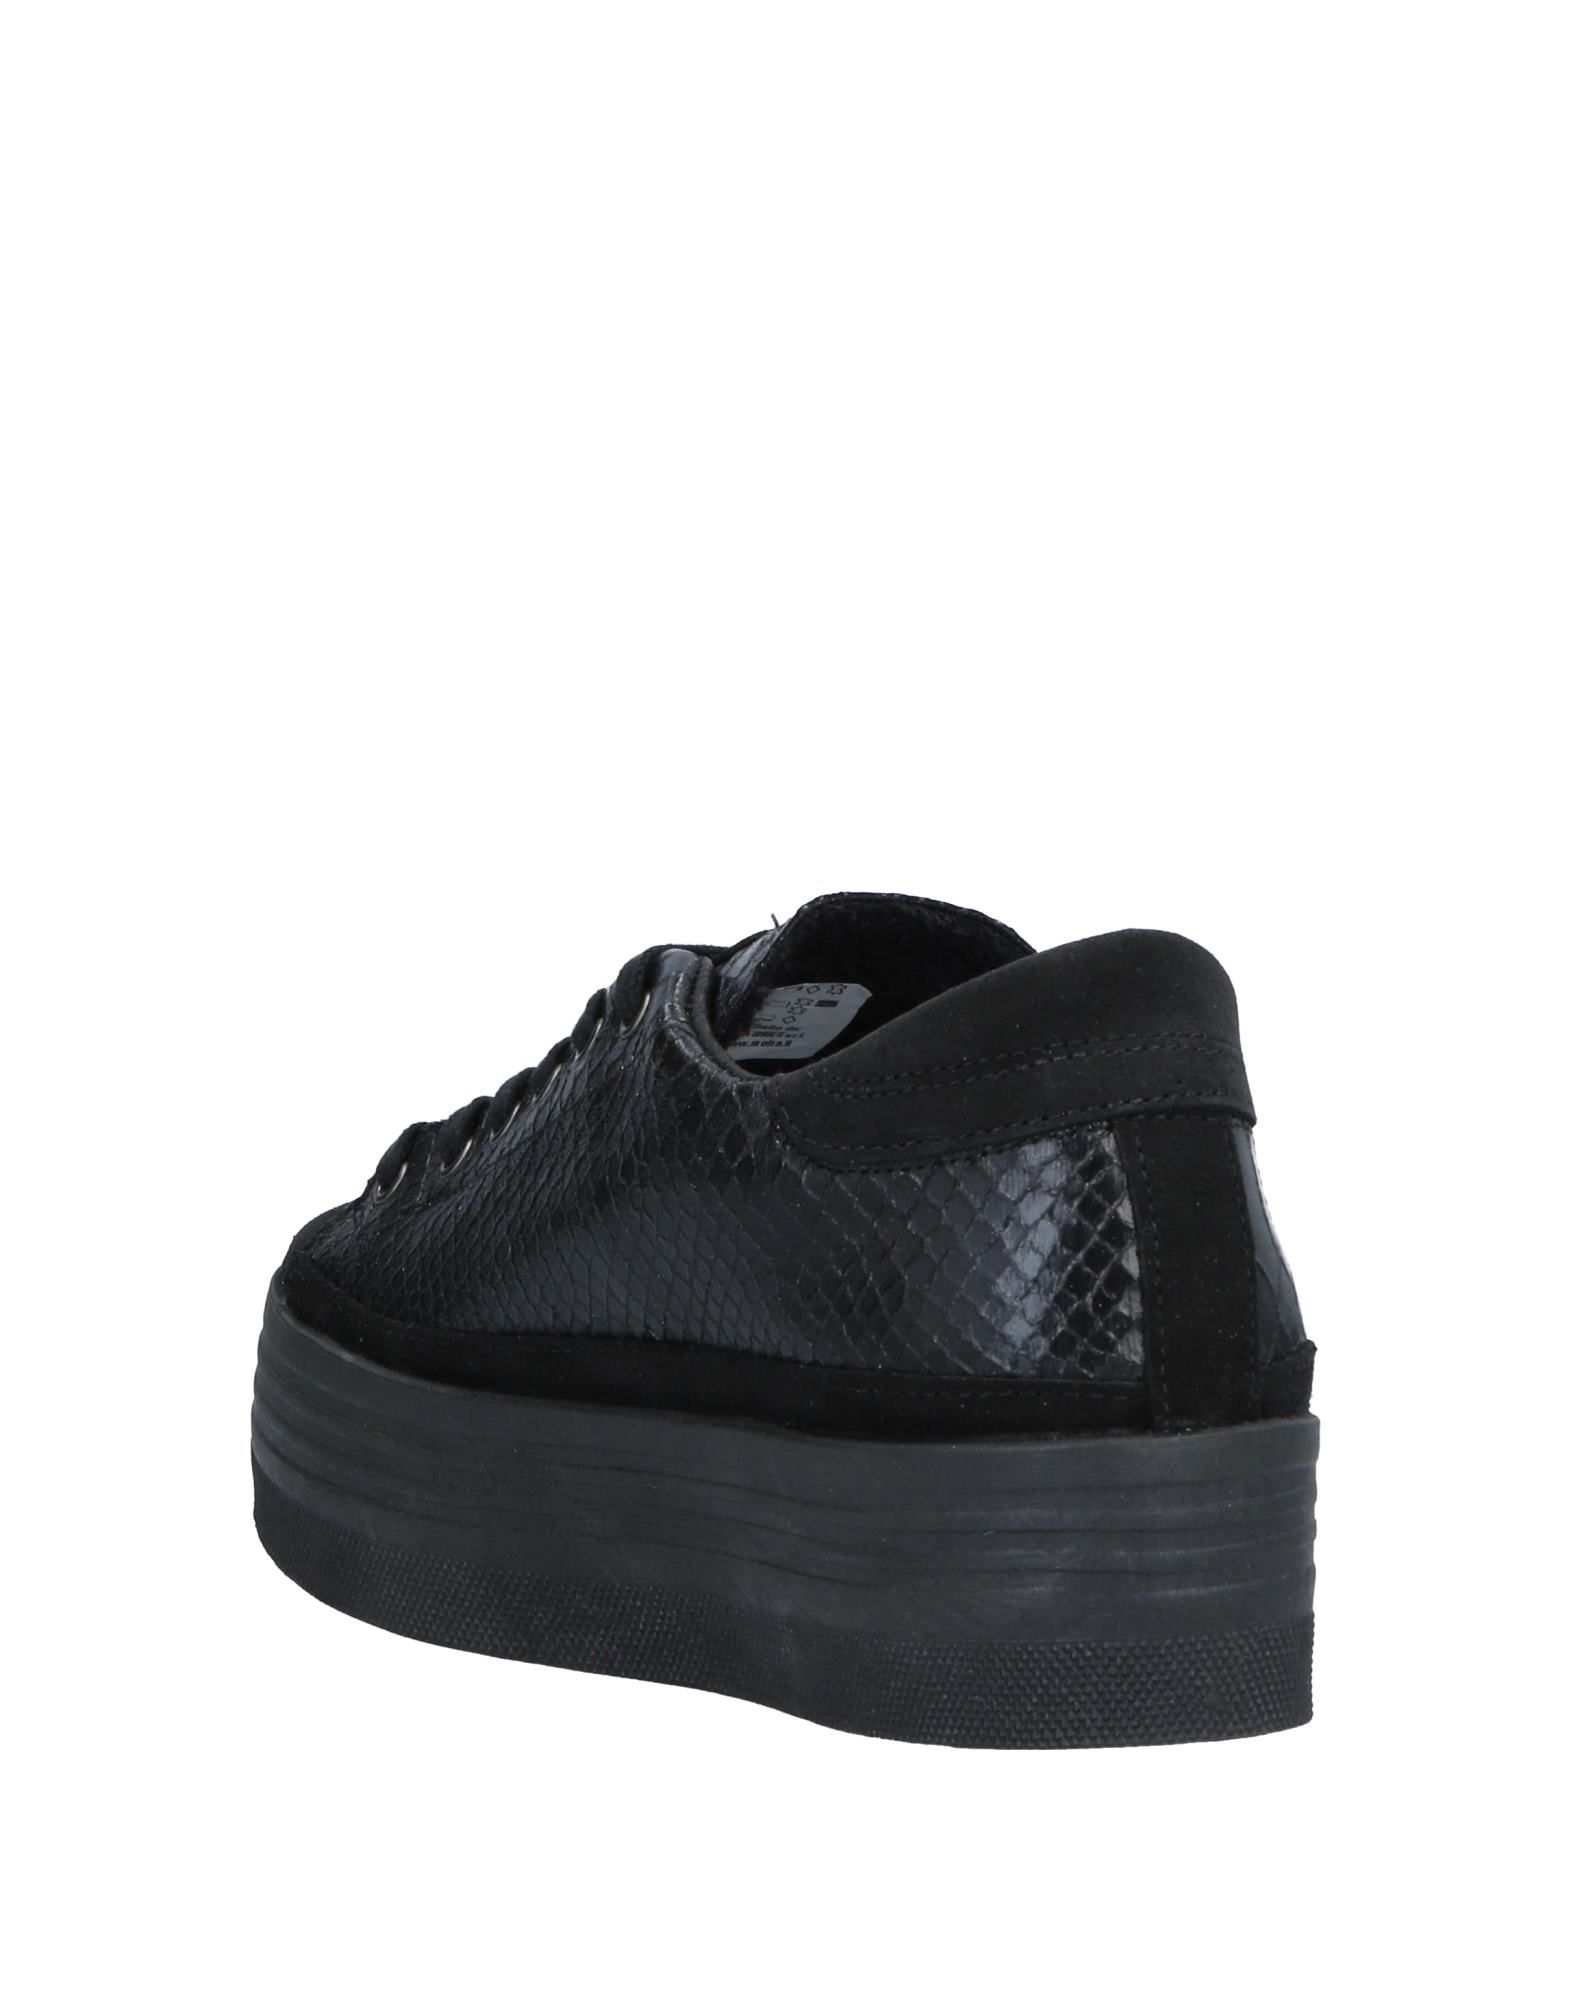 Beverly Hills Damen Polo Club Sneakers Damen Hills  11527489EB Heiße Schuhe 5e61bf